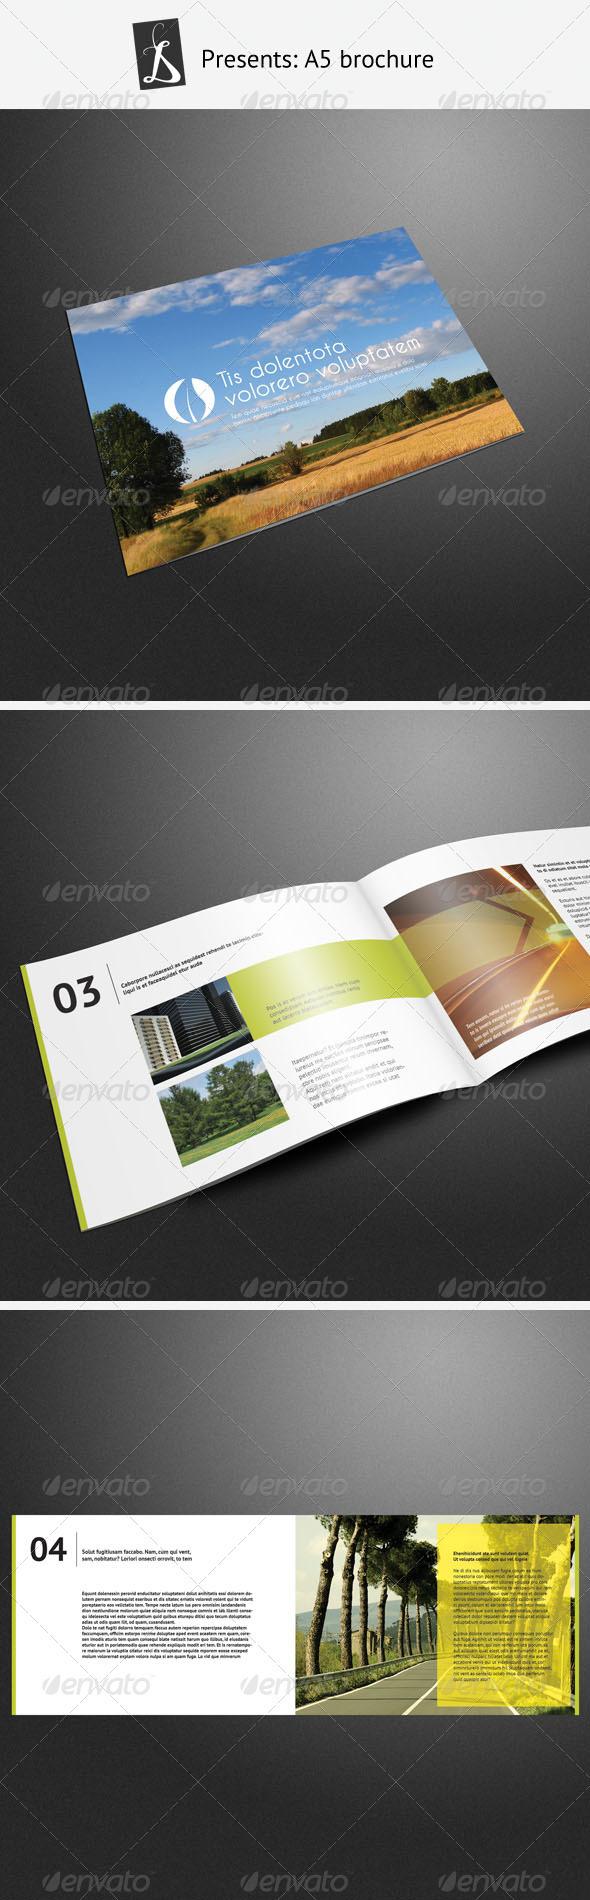 A5 Brochure 2 - Corporate Brochures